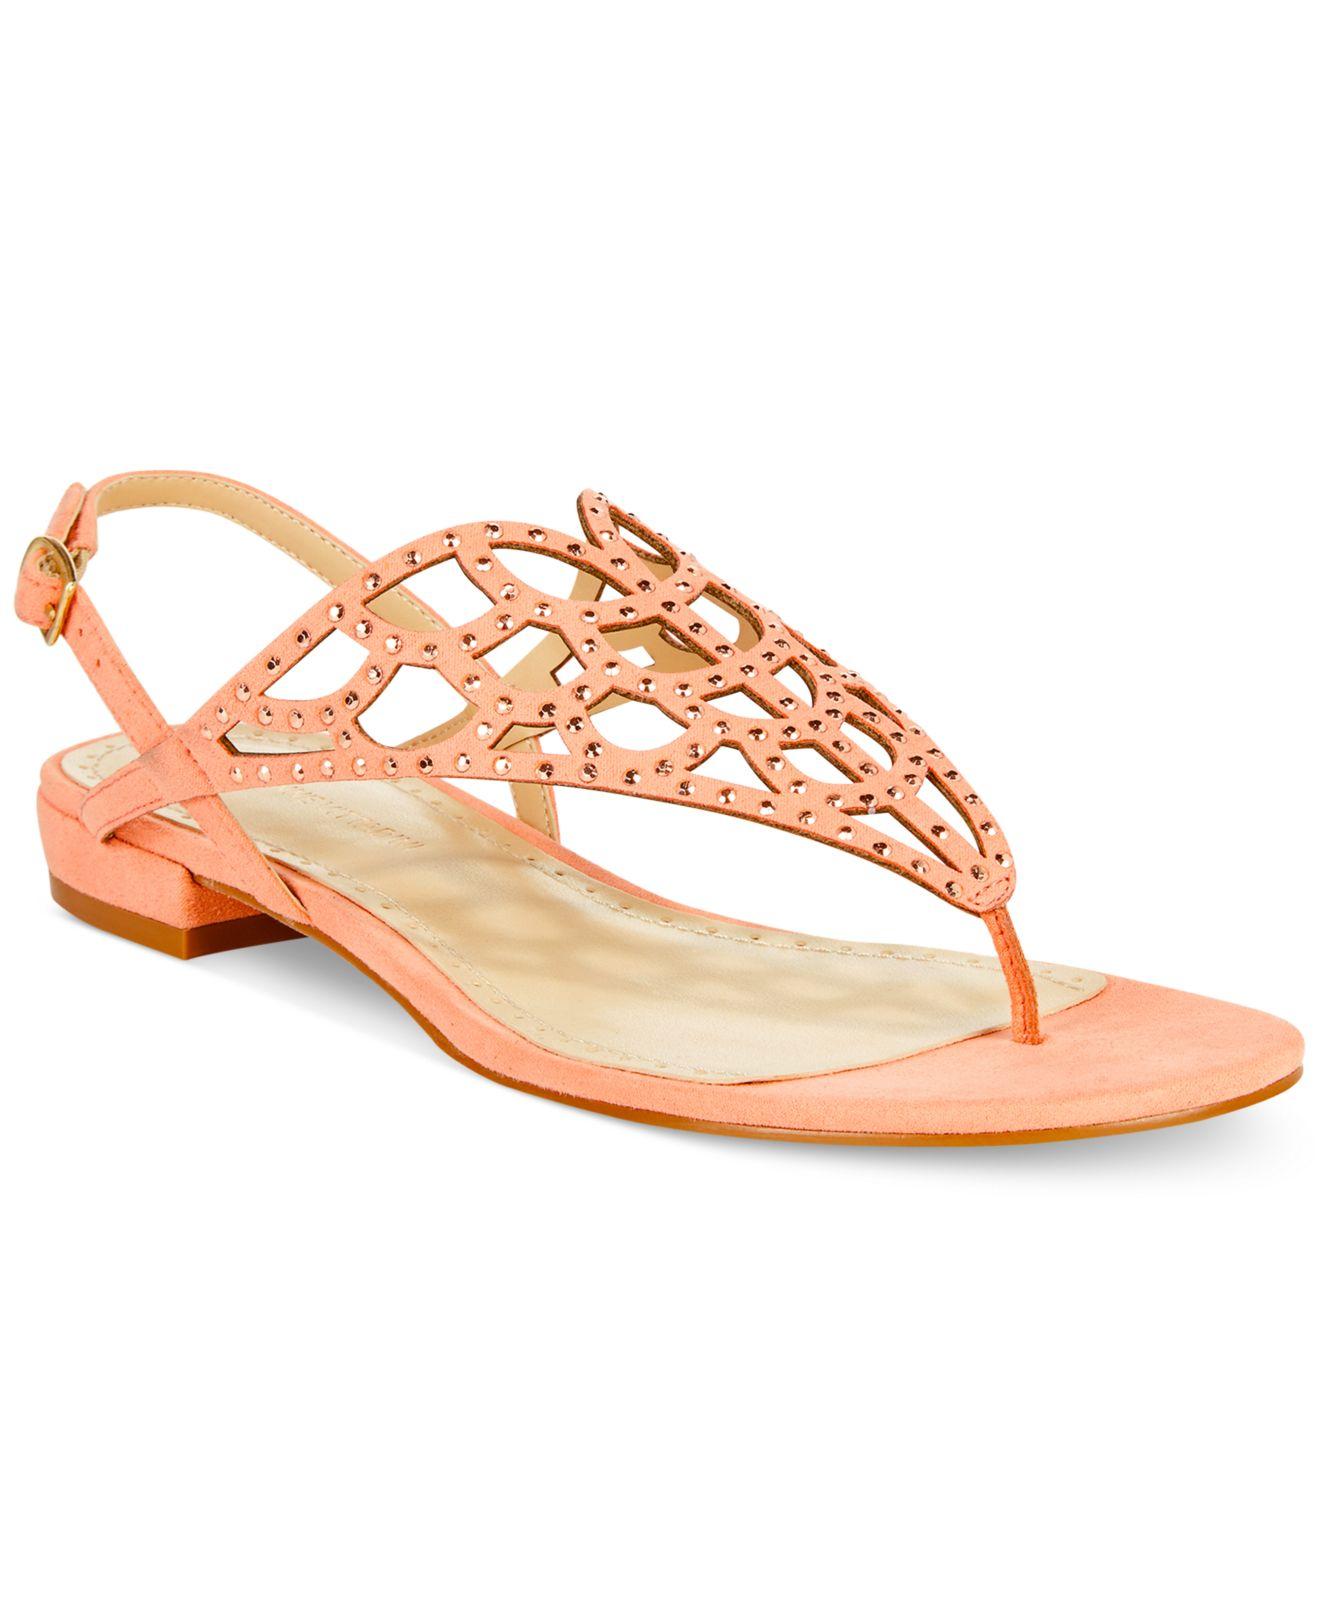 c003078fbac5 Lyst - Adrienne Vittadini Molli Crystal Thong Sandals in Orange